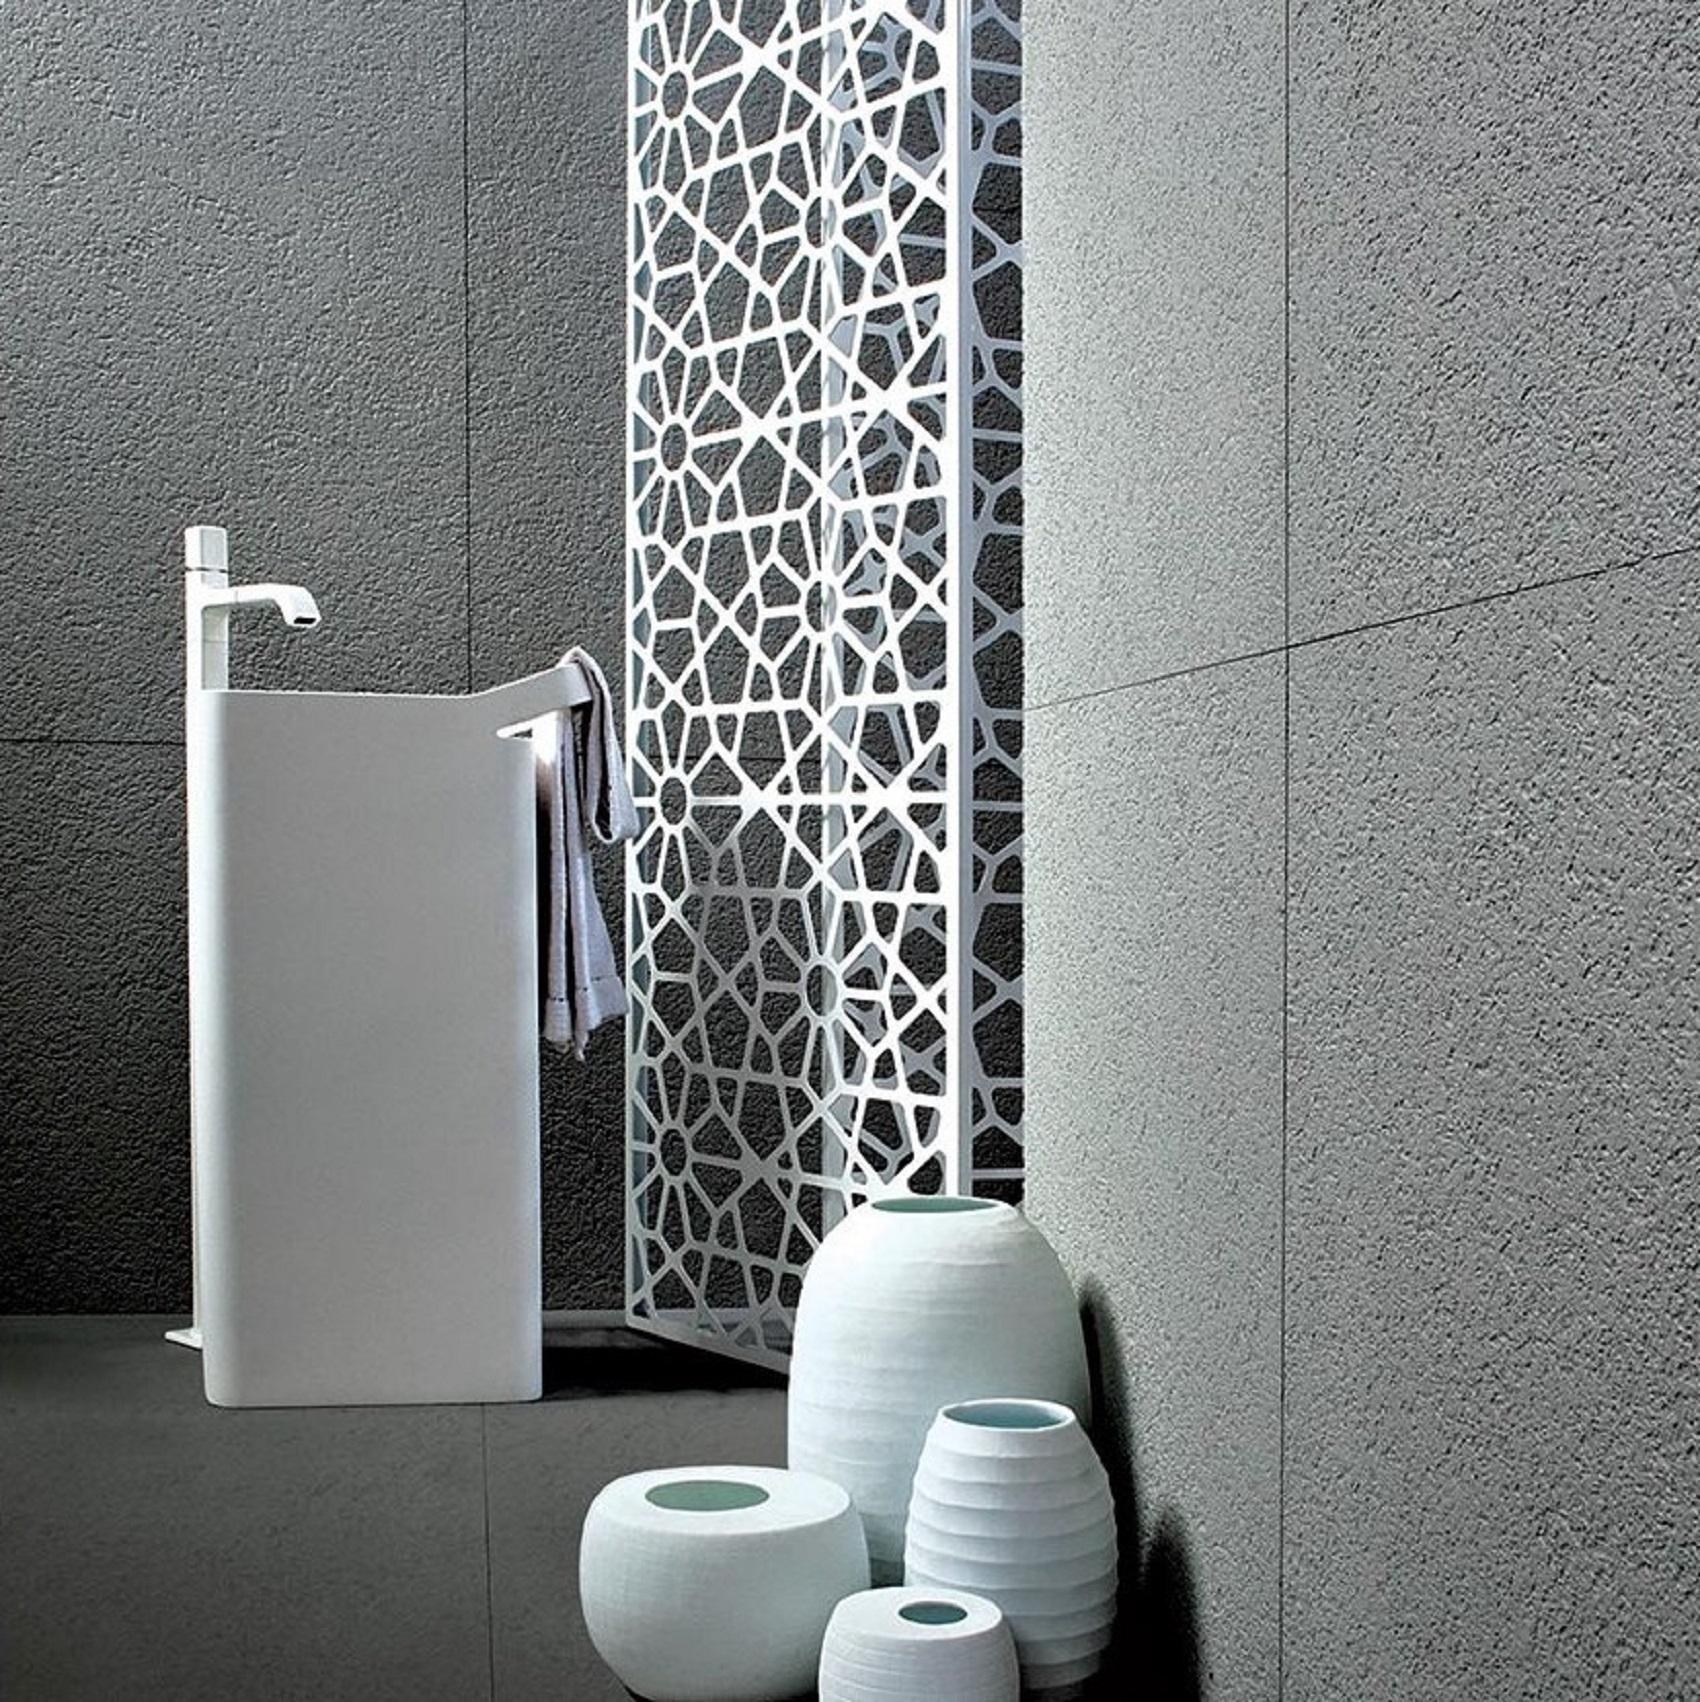 Polaris Designed For Living Srl zucchetti kos lab 03 freestanding washbasin - tattahome